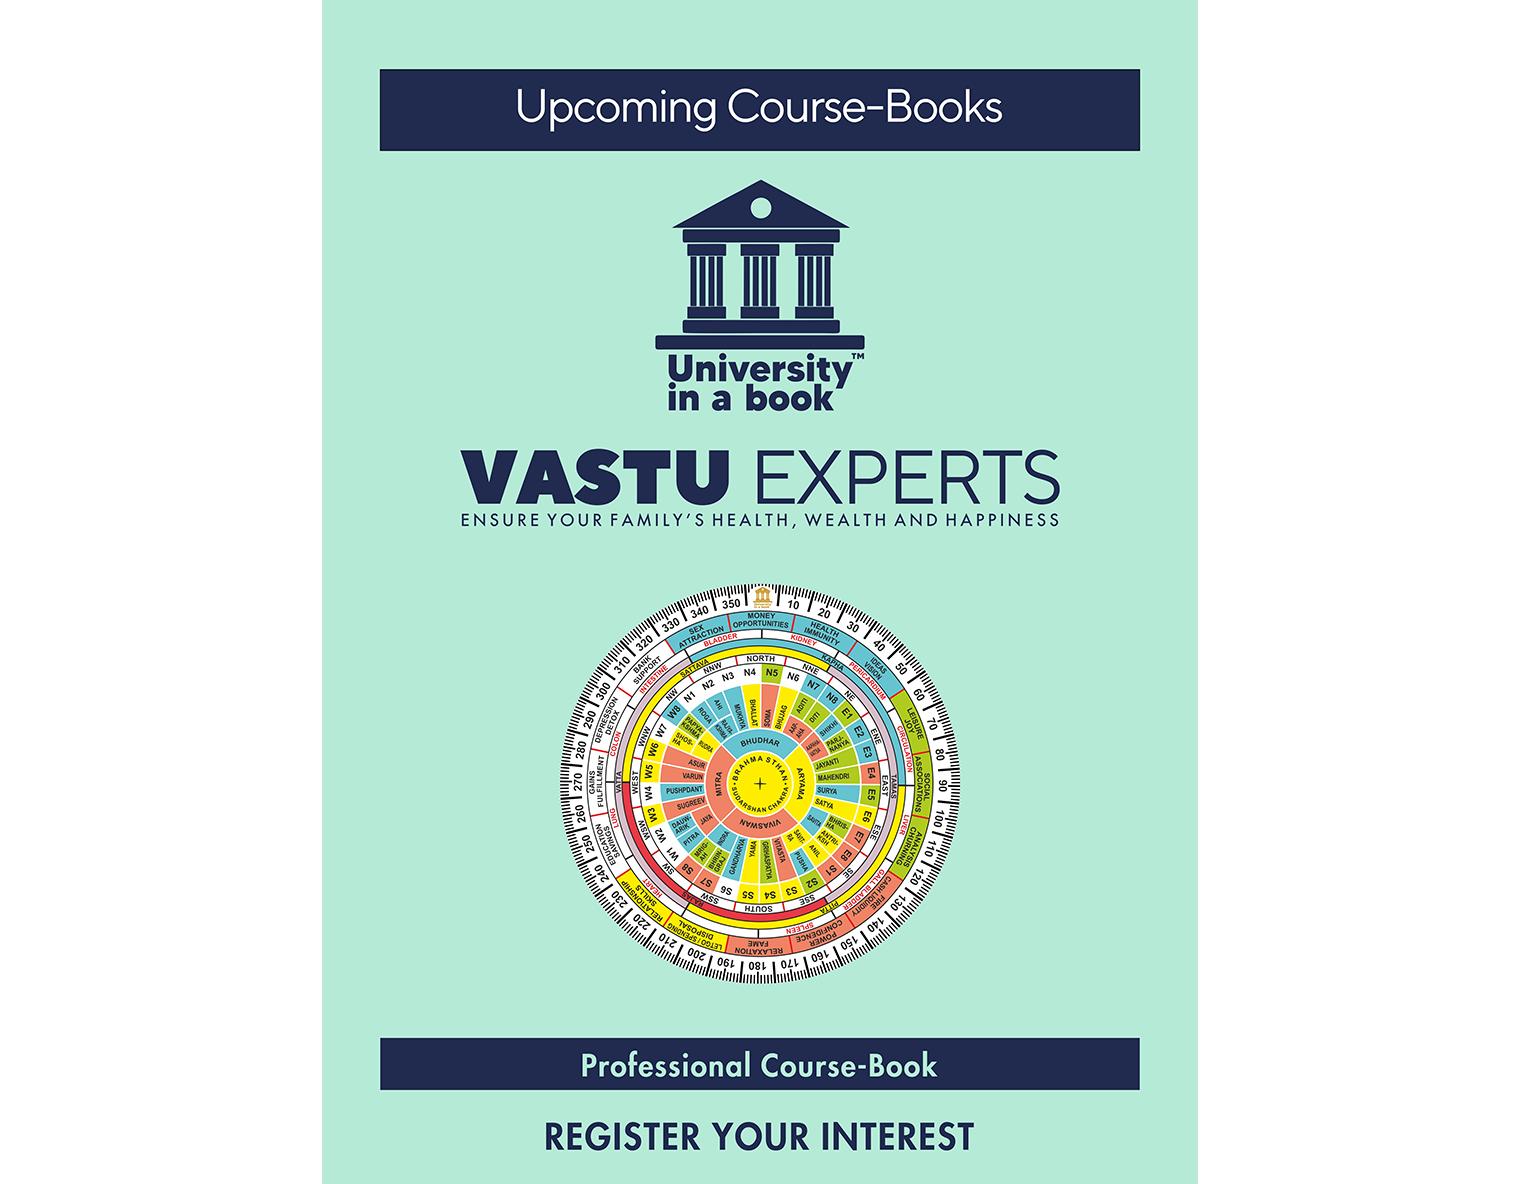 VastuExperts Professional Course-Book